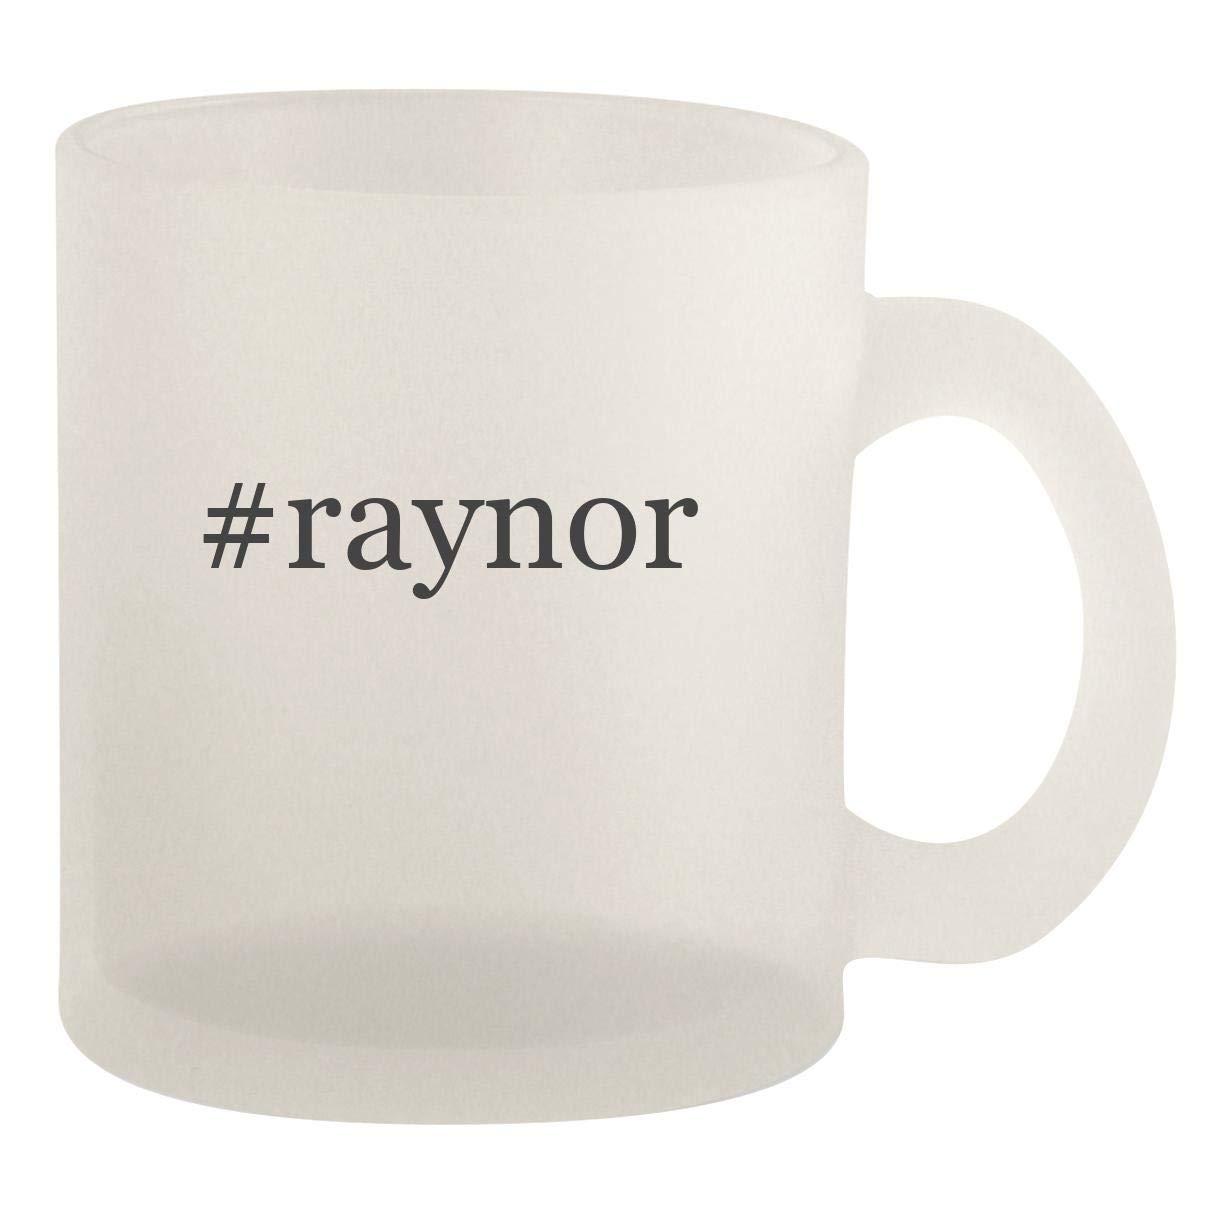 #raynor - Glass 10oz Frosted Coffee Mug